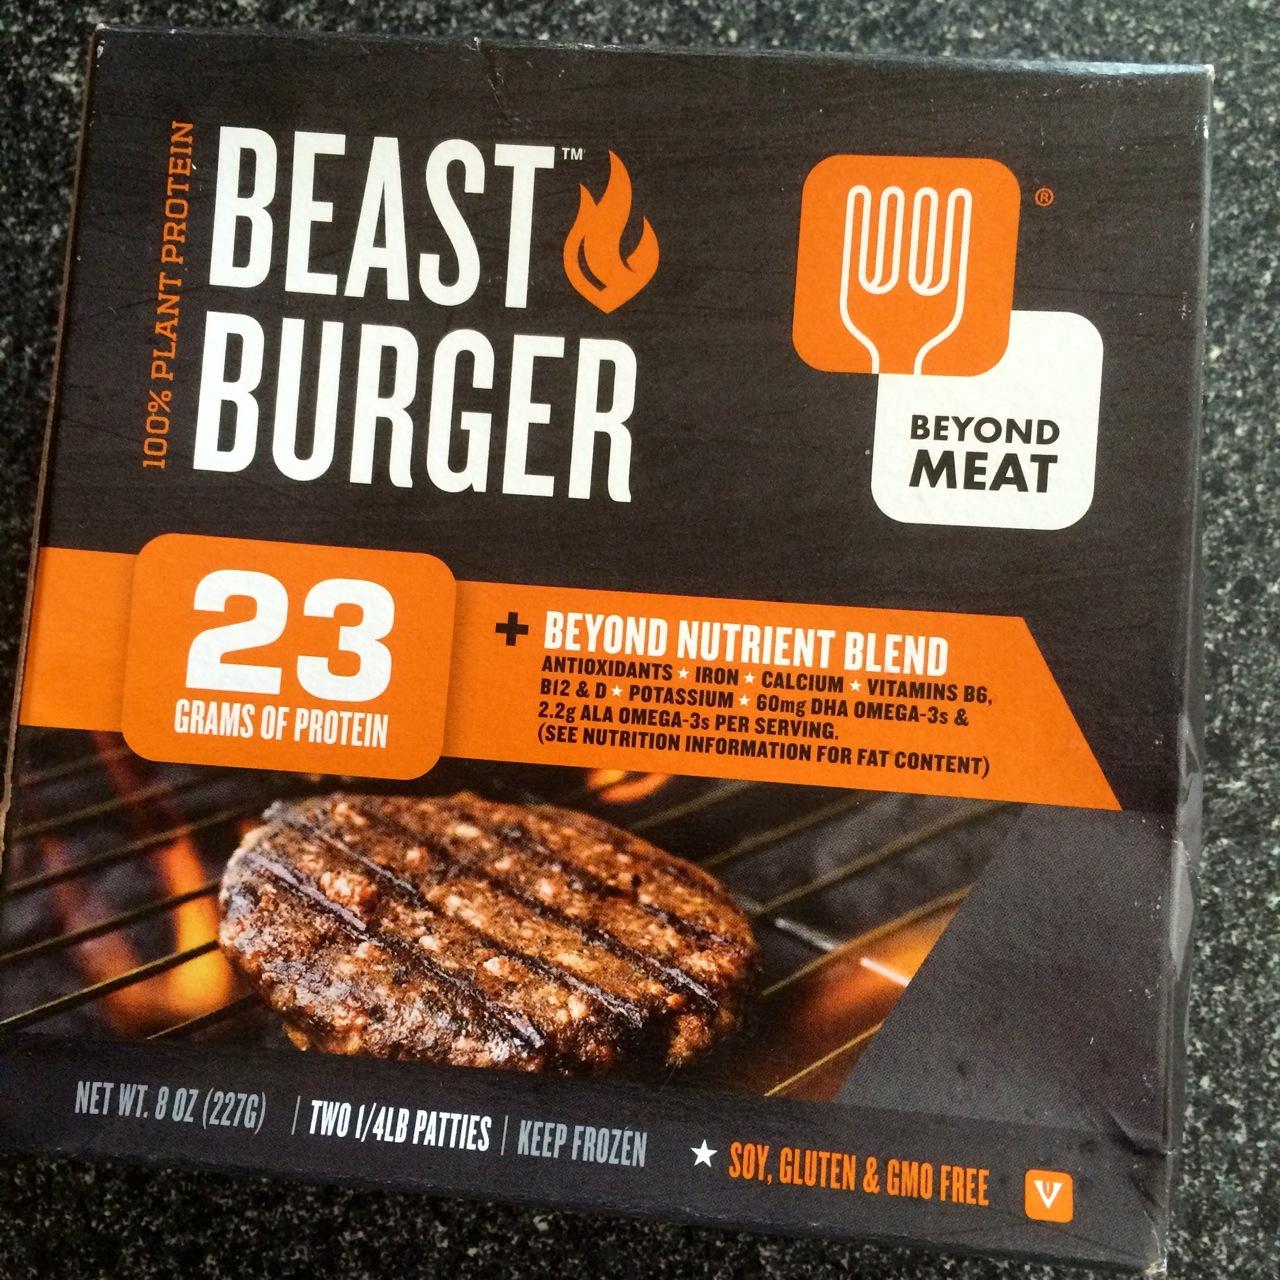 https://i1.wp.com/fatgayvegan.com/wp-content/uploads/2015/06/beast-burger-beyond-meat.jpg?fit=1280%2C1280